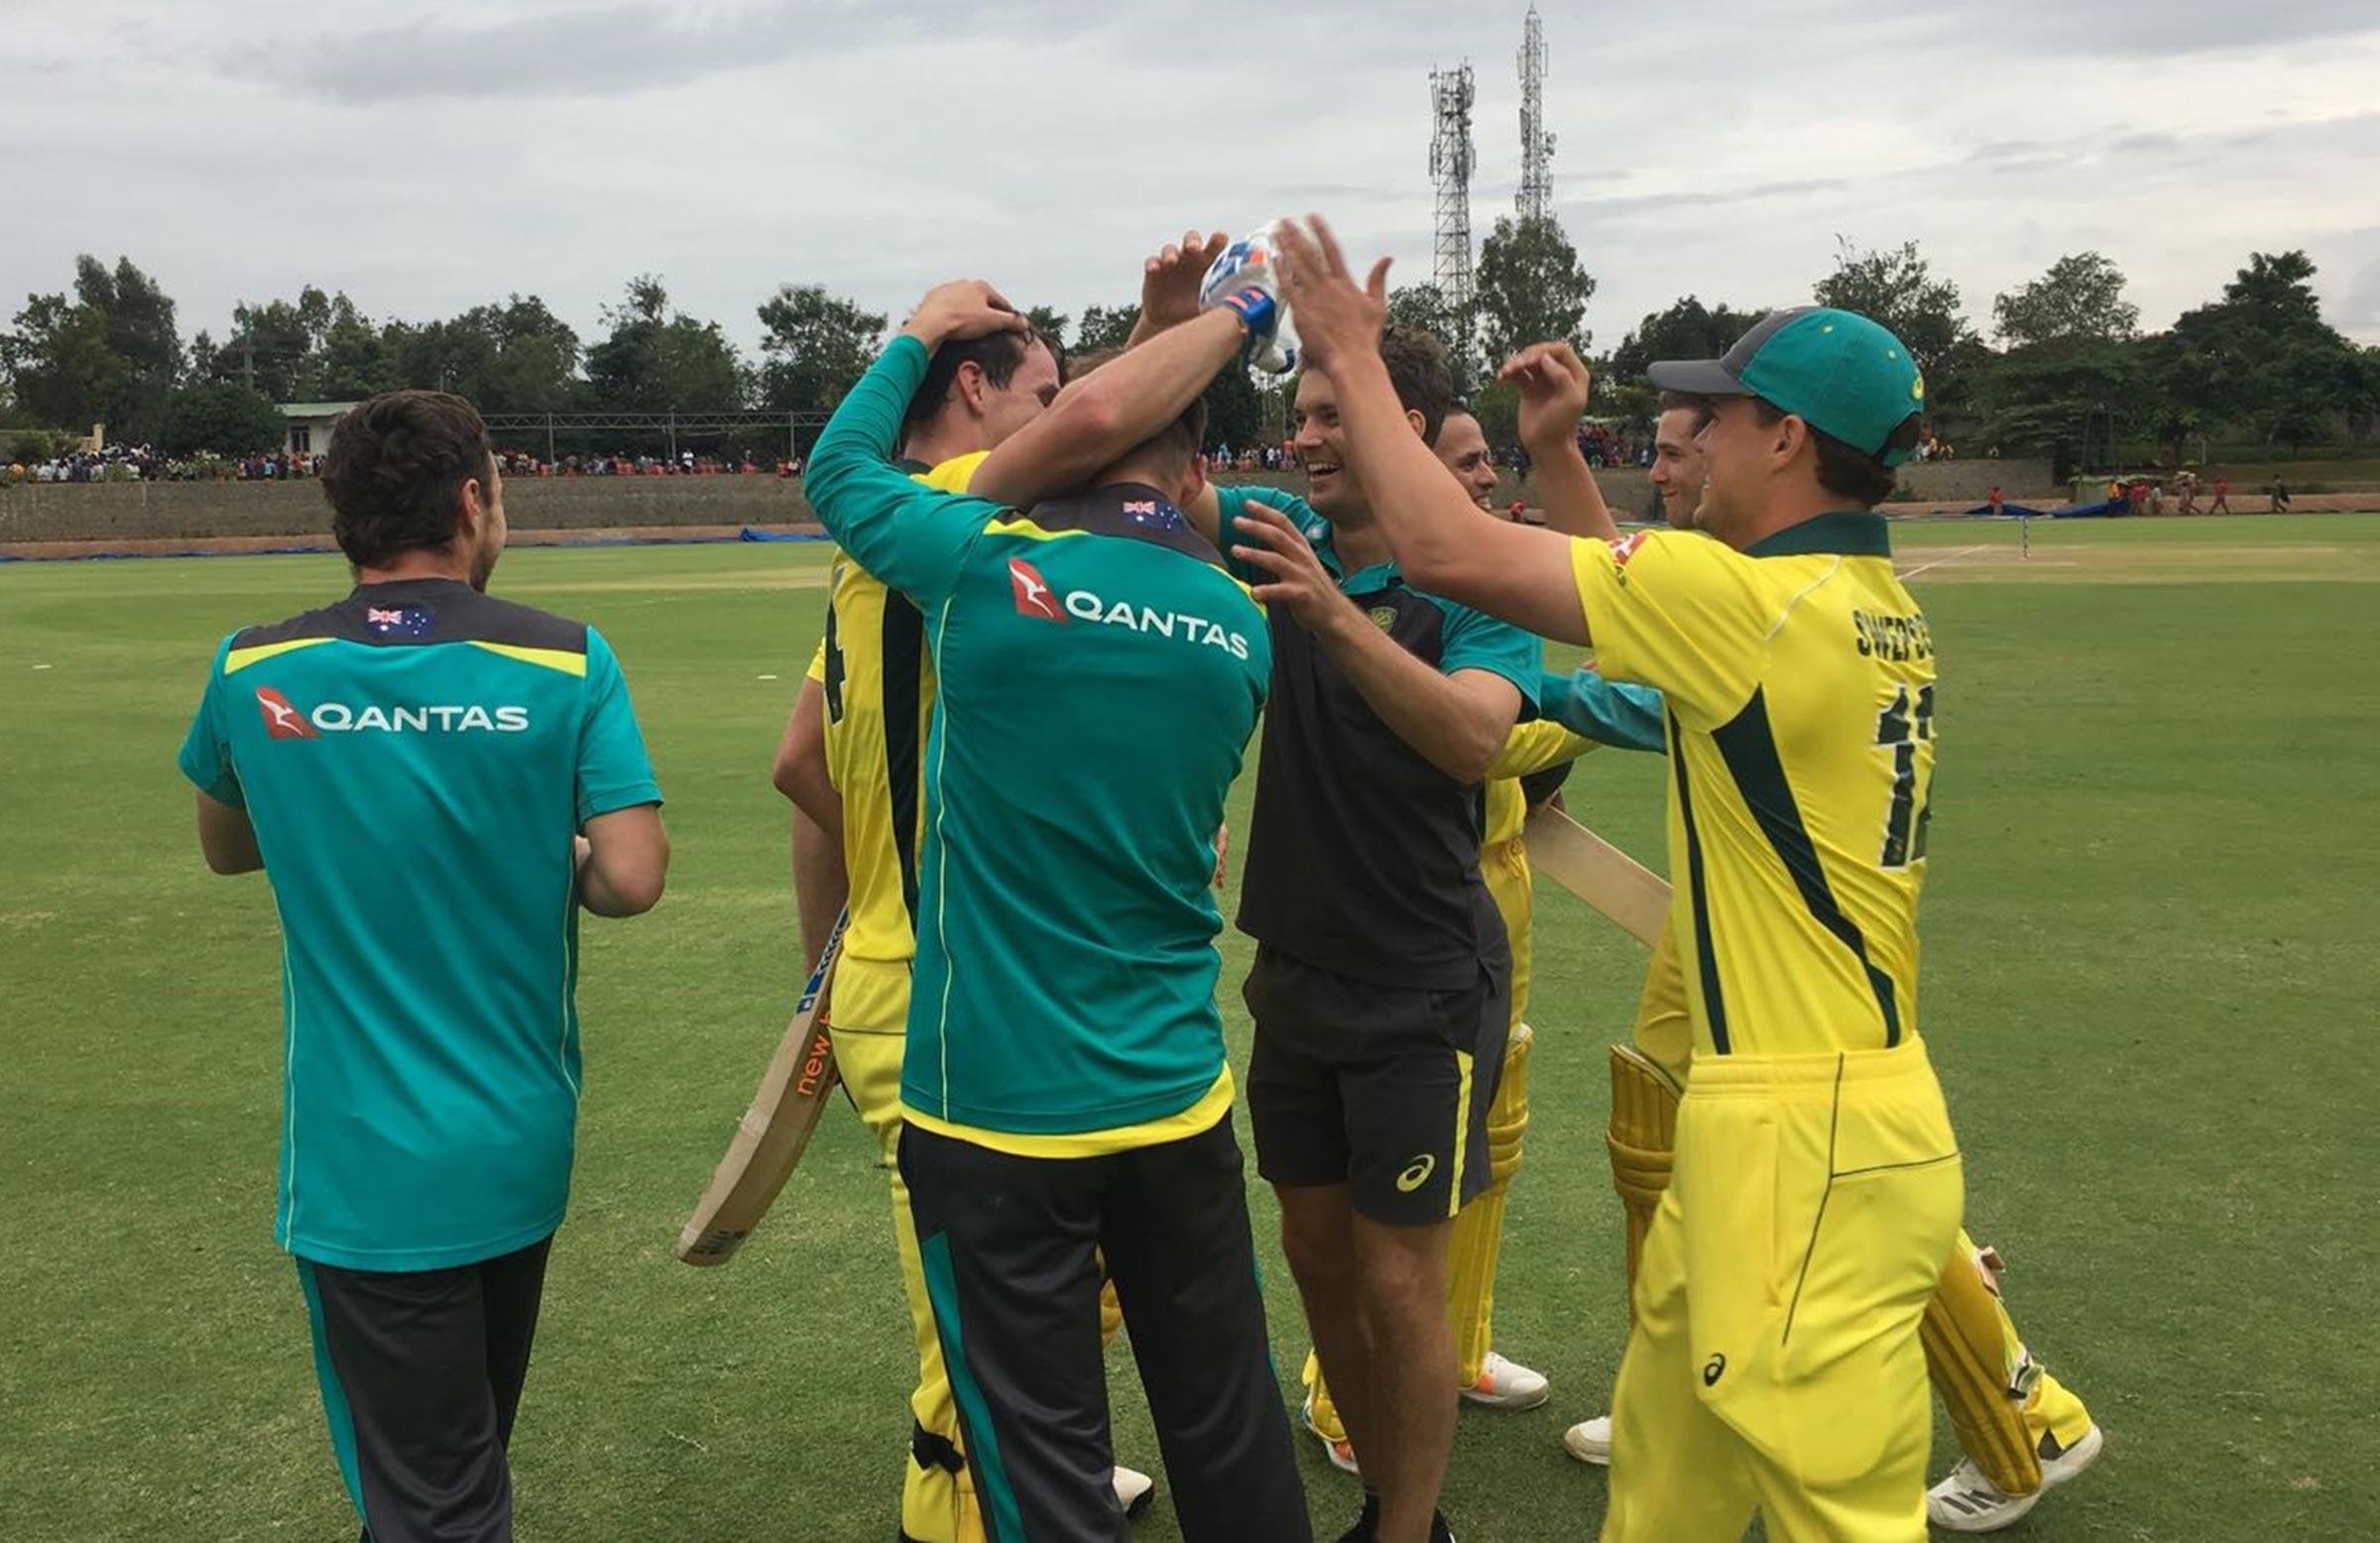 Swamped! // cricket.com.au